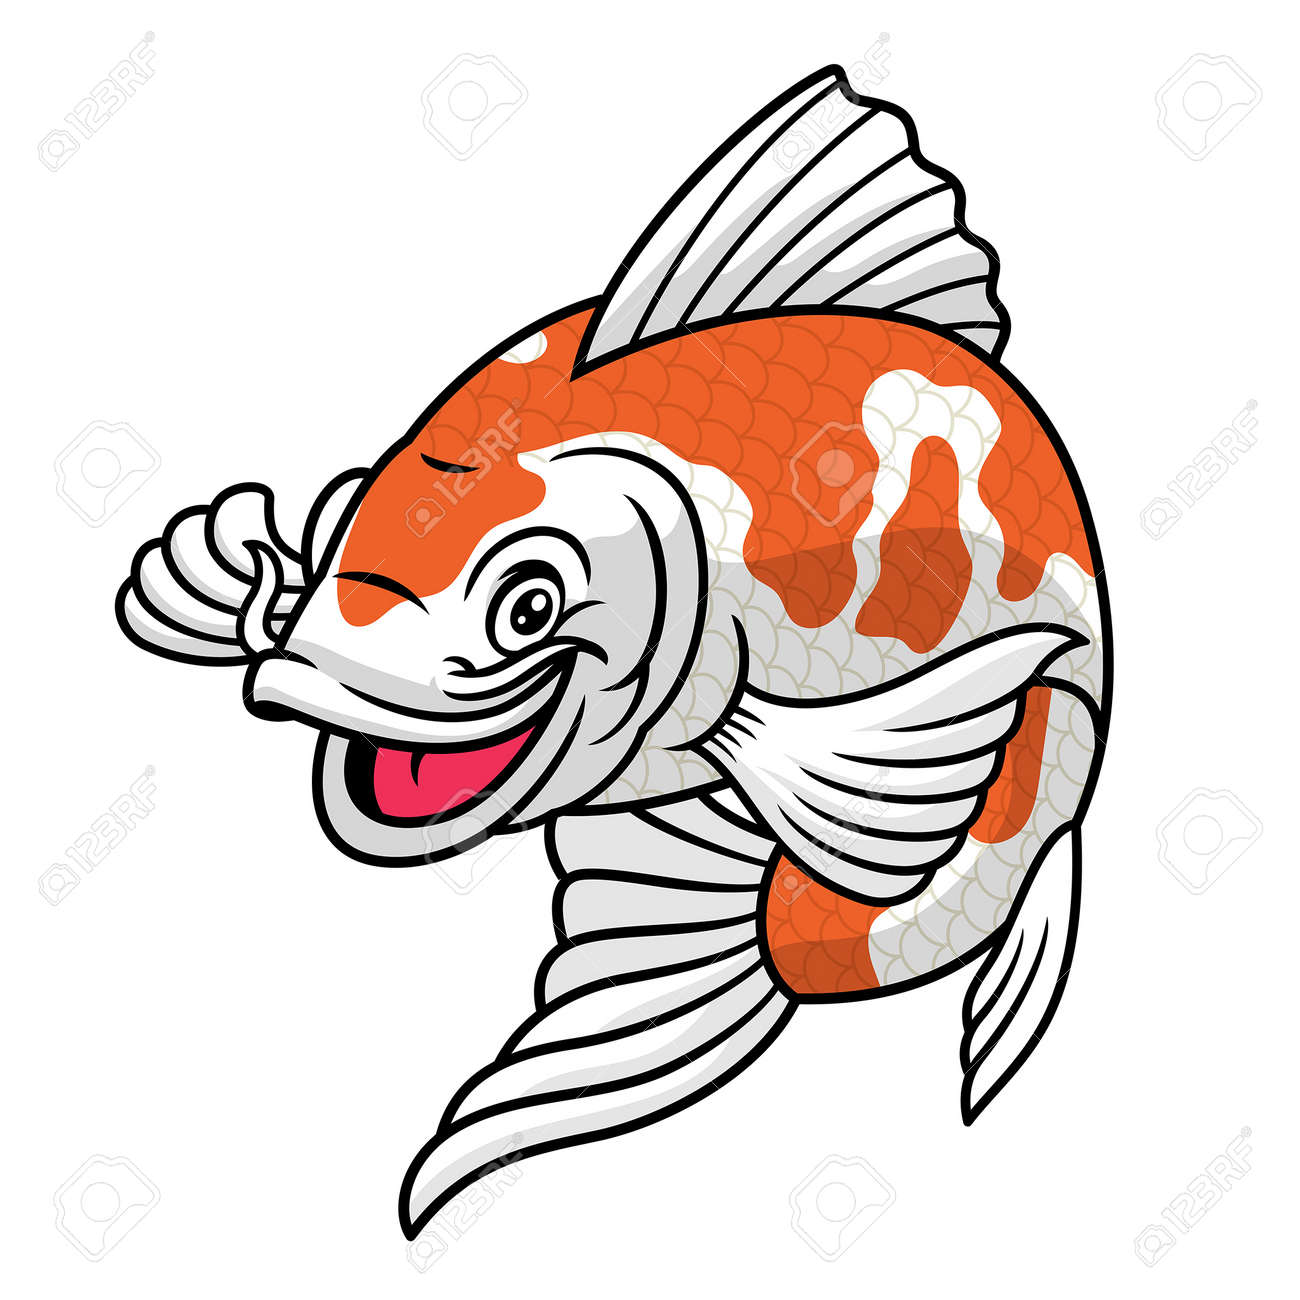 koi fish cartoon character - 163540877